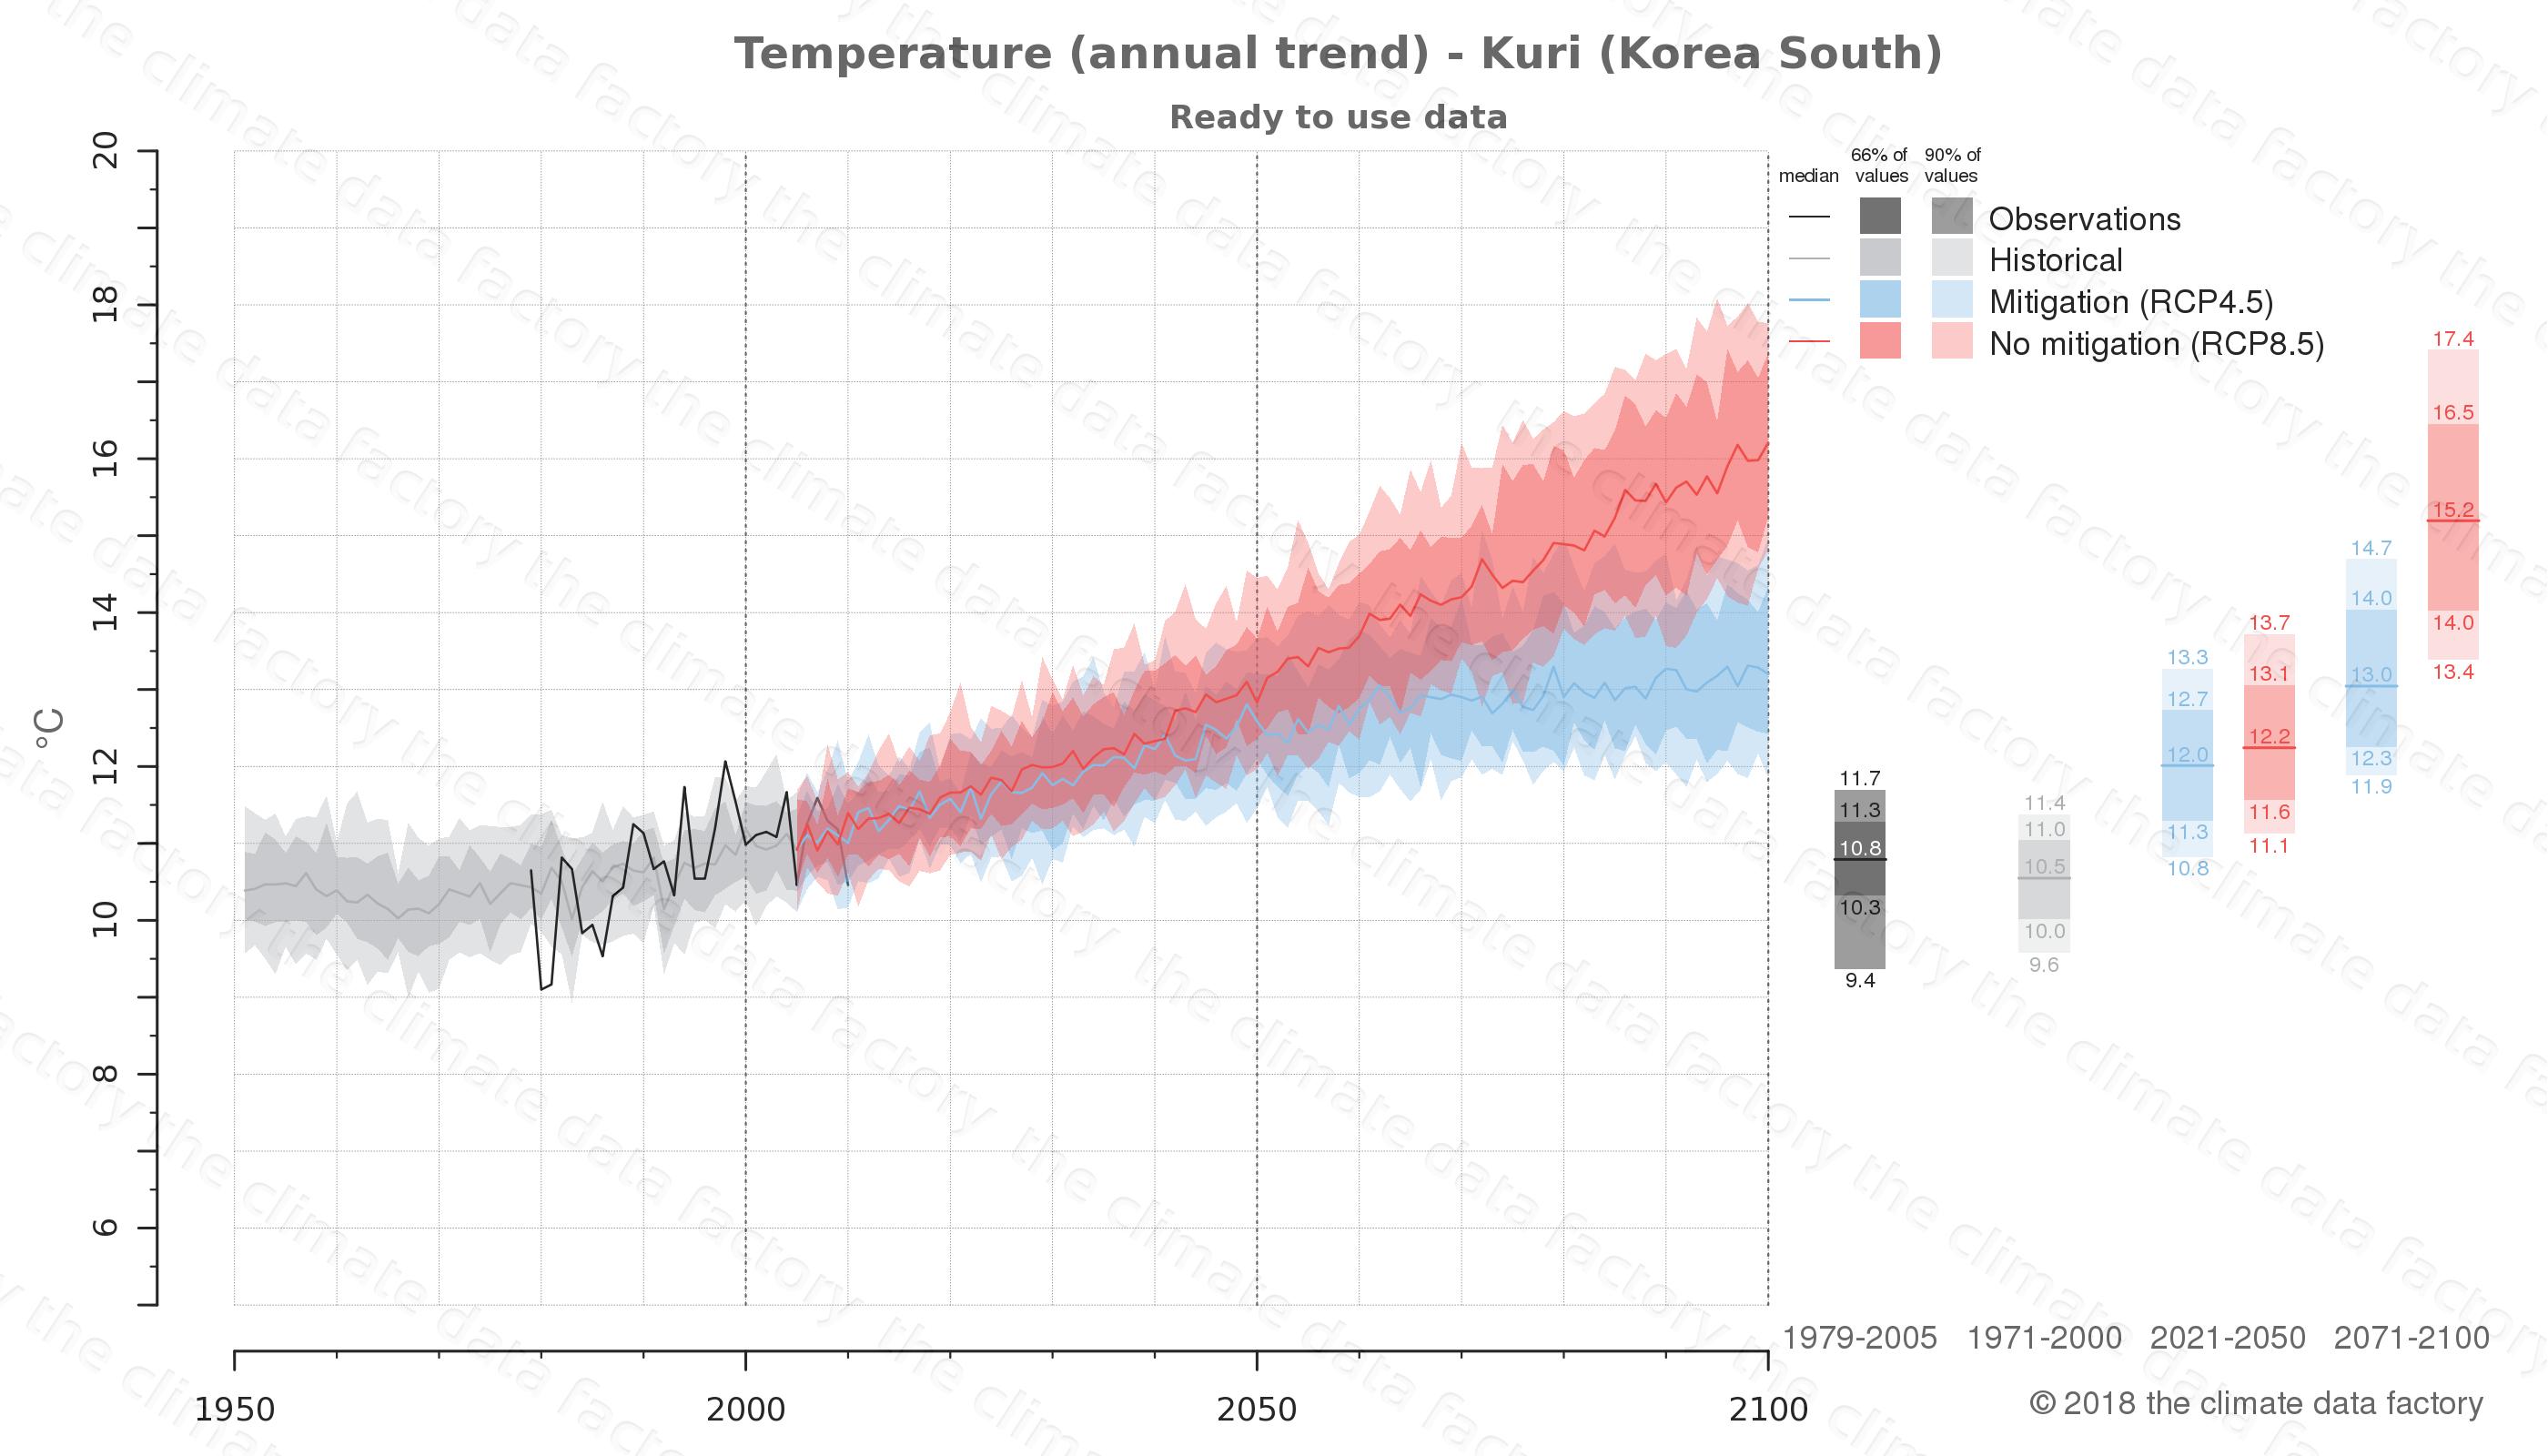 climate change data policy adaptation climate graph city data temperature kuri south korea